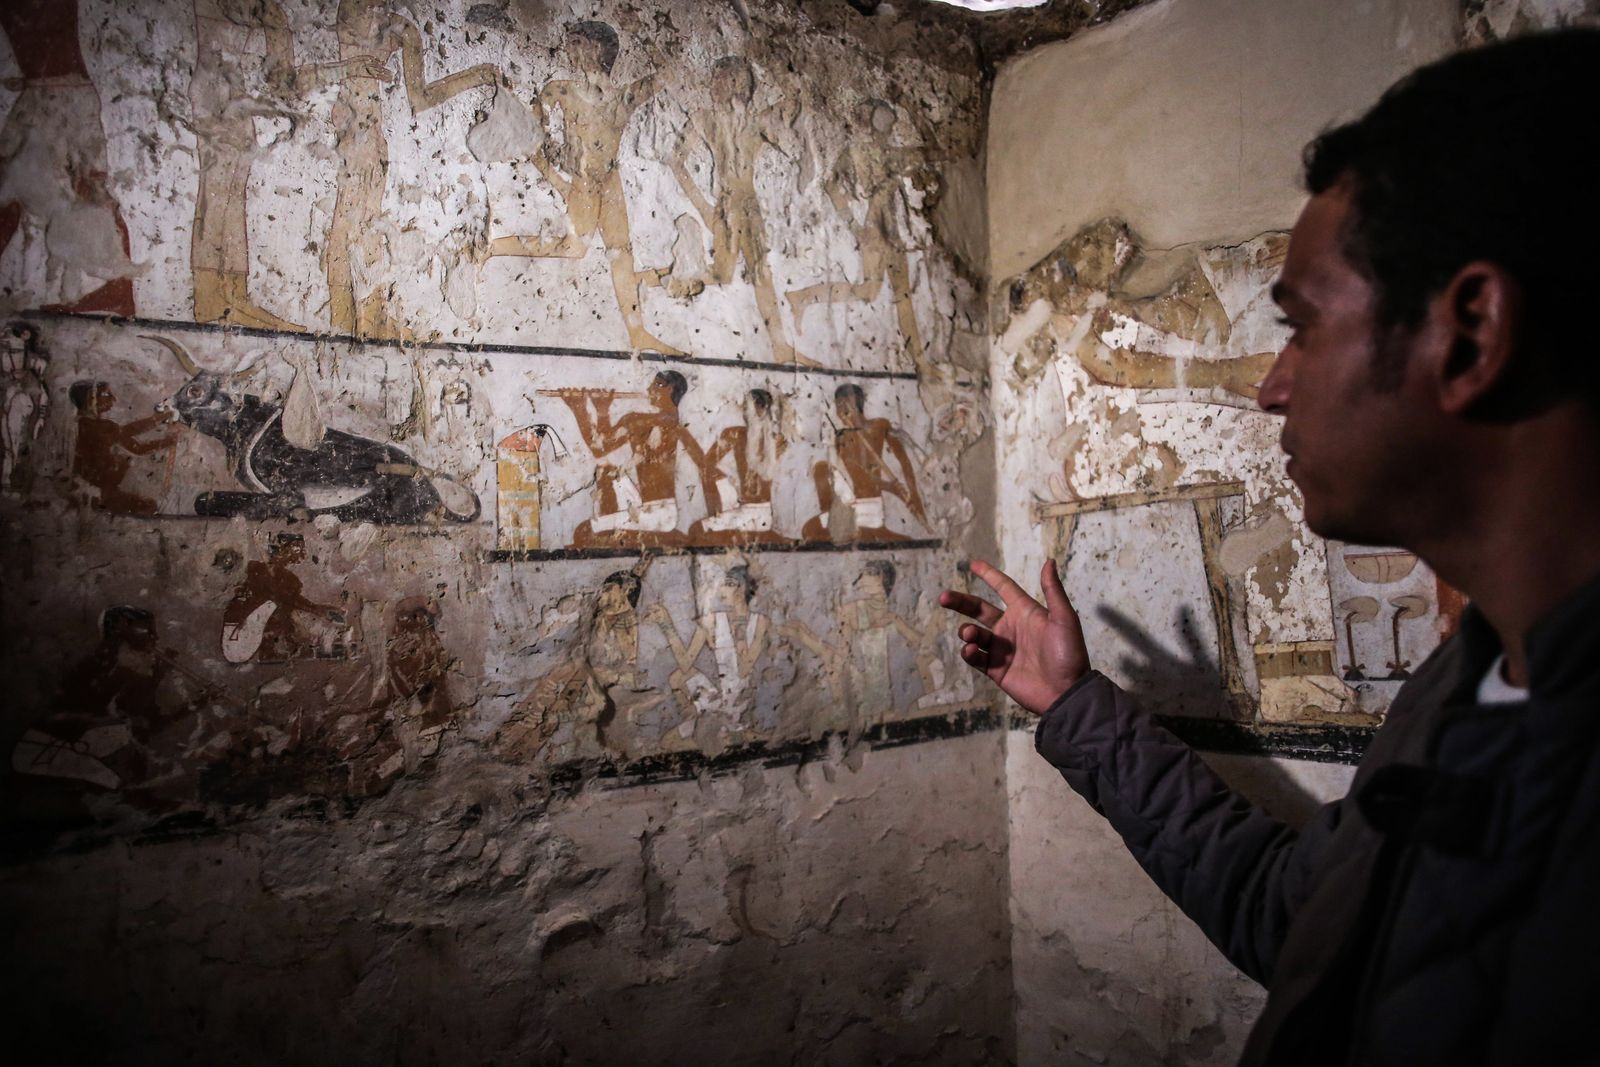 Archäologen entdecken neue Grabstätte bei Gizeh